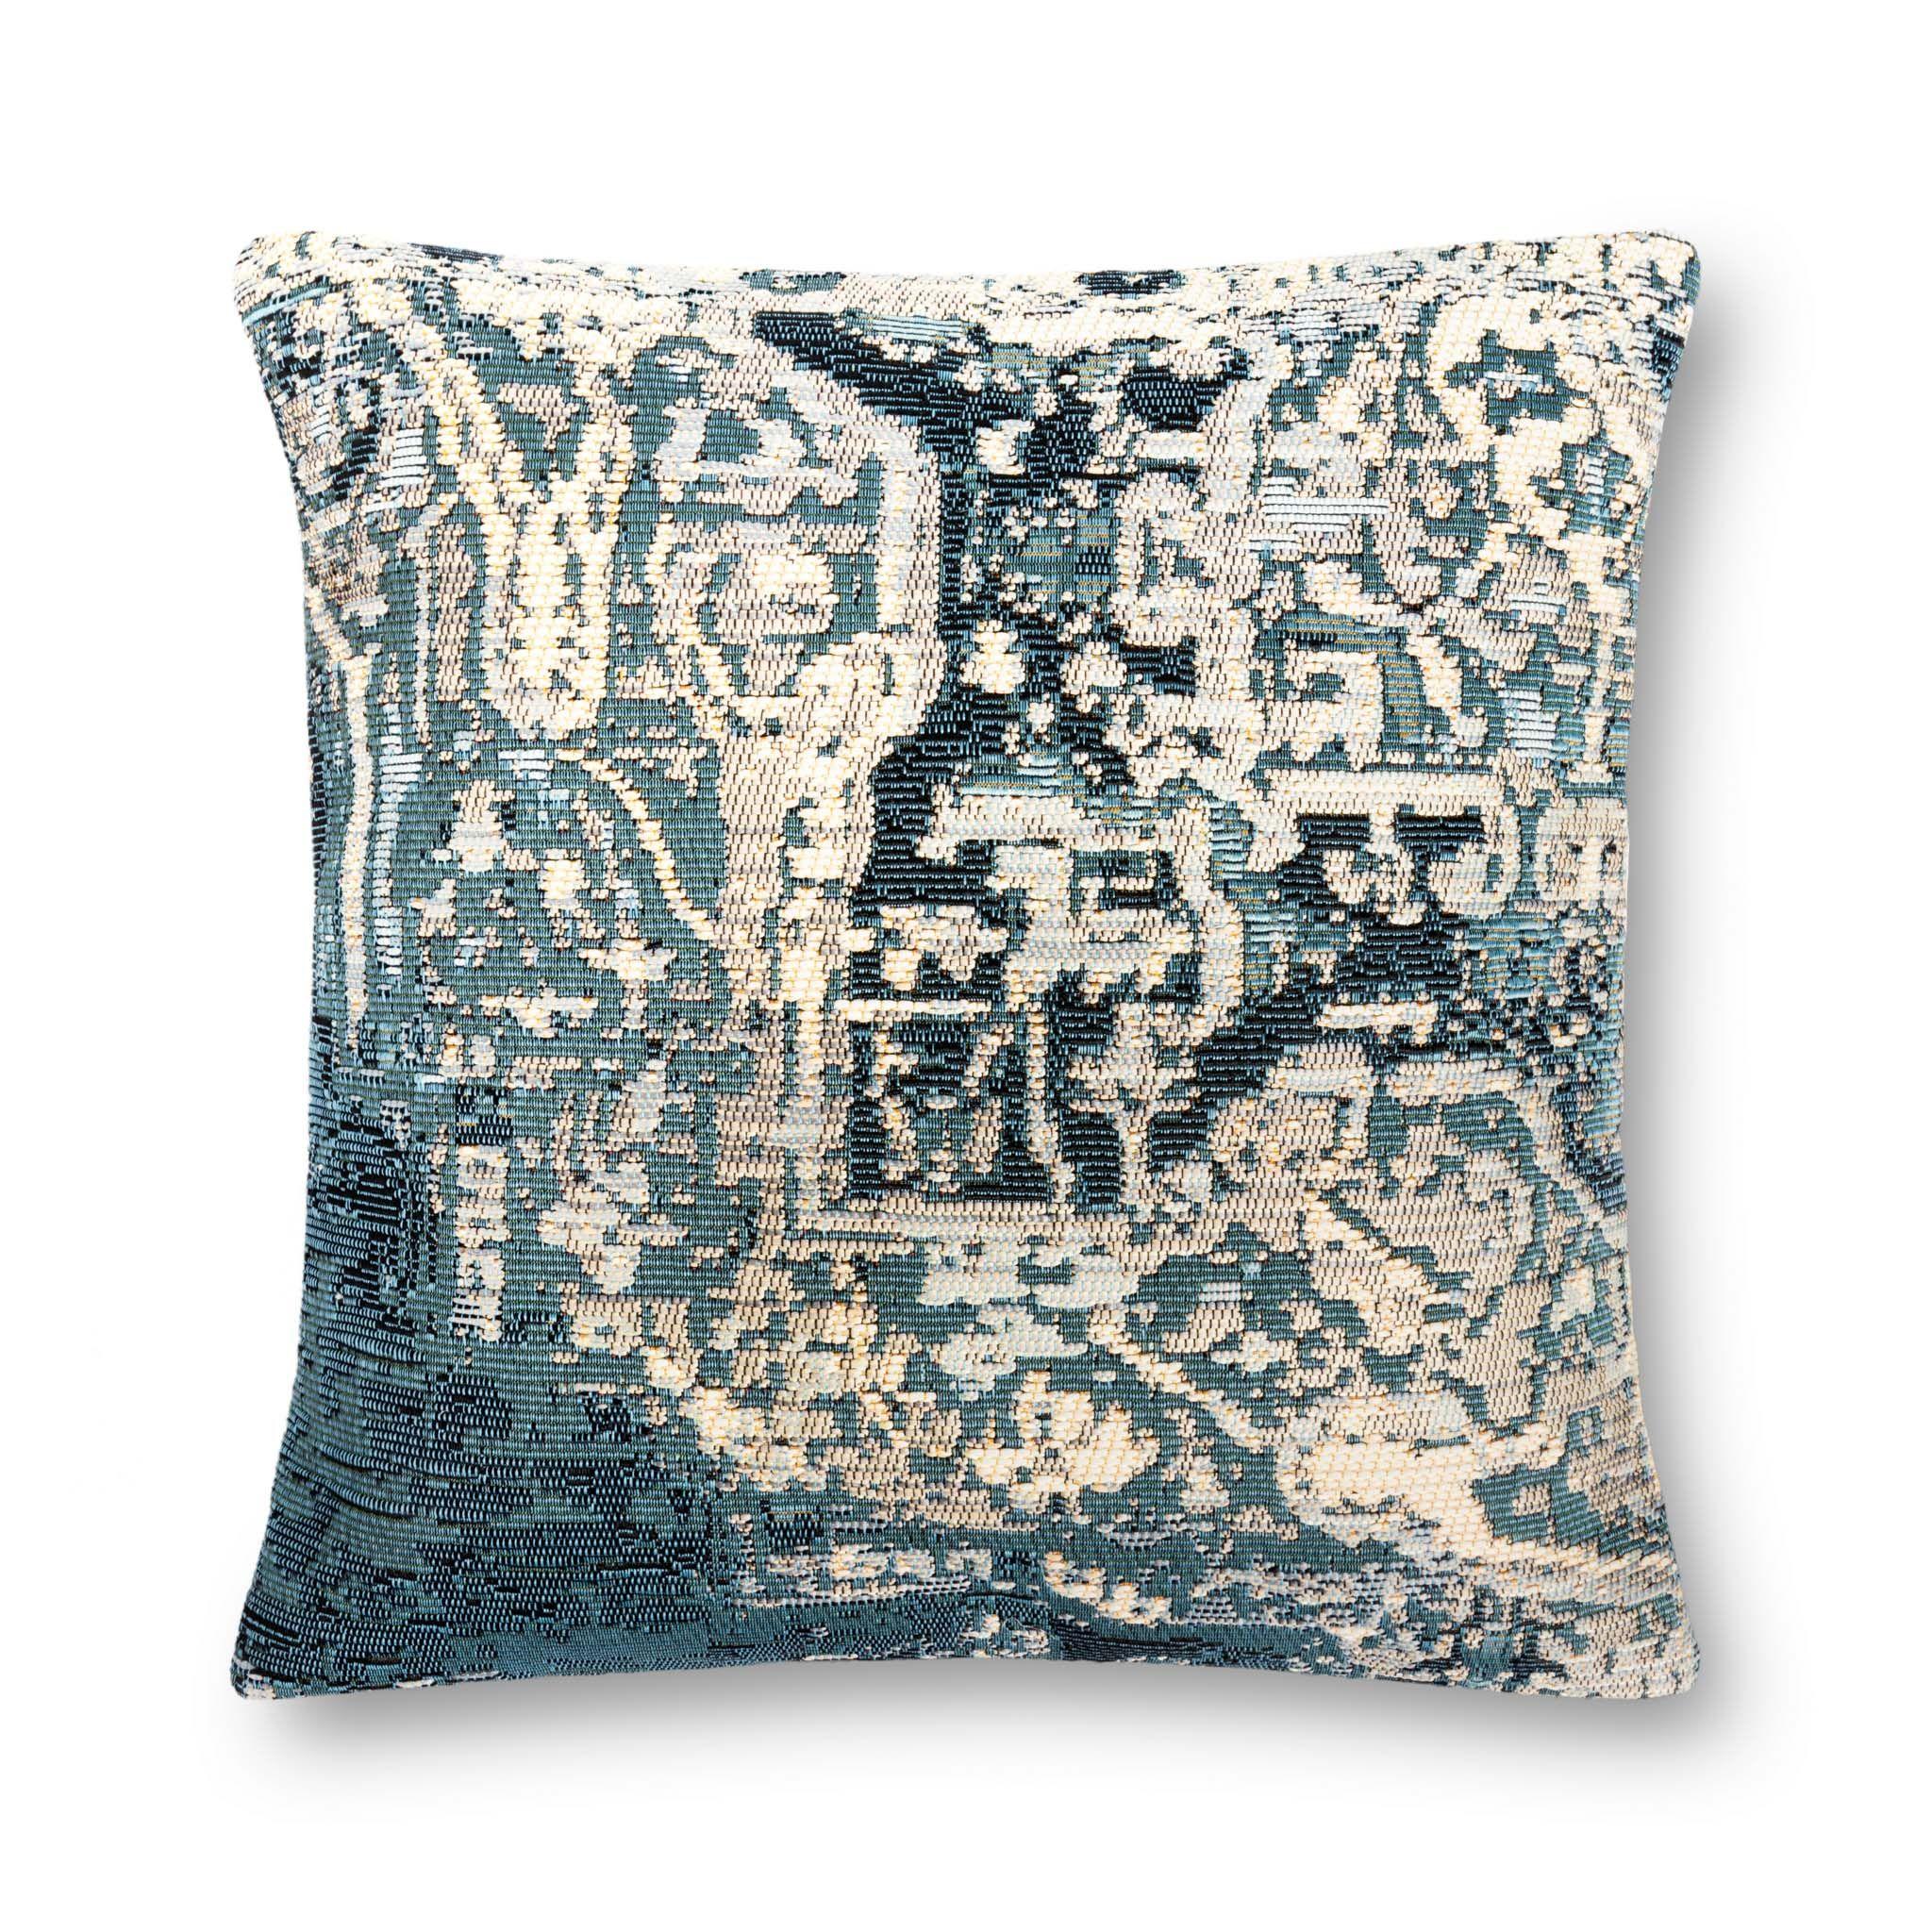 "Kea Pillow Cover - 22"" x 22"""